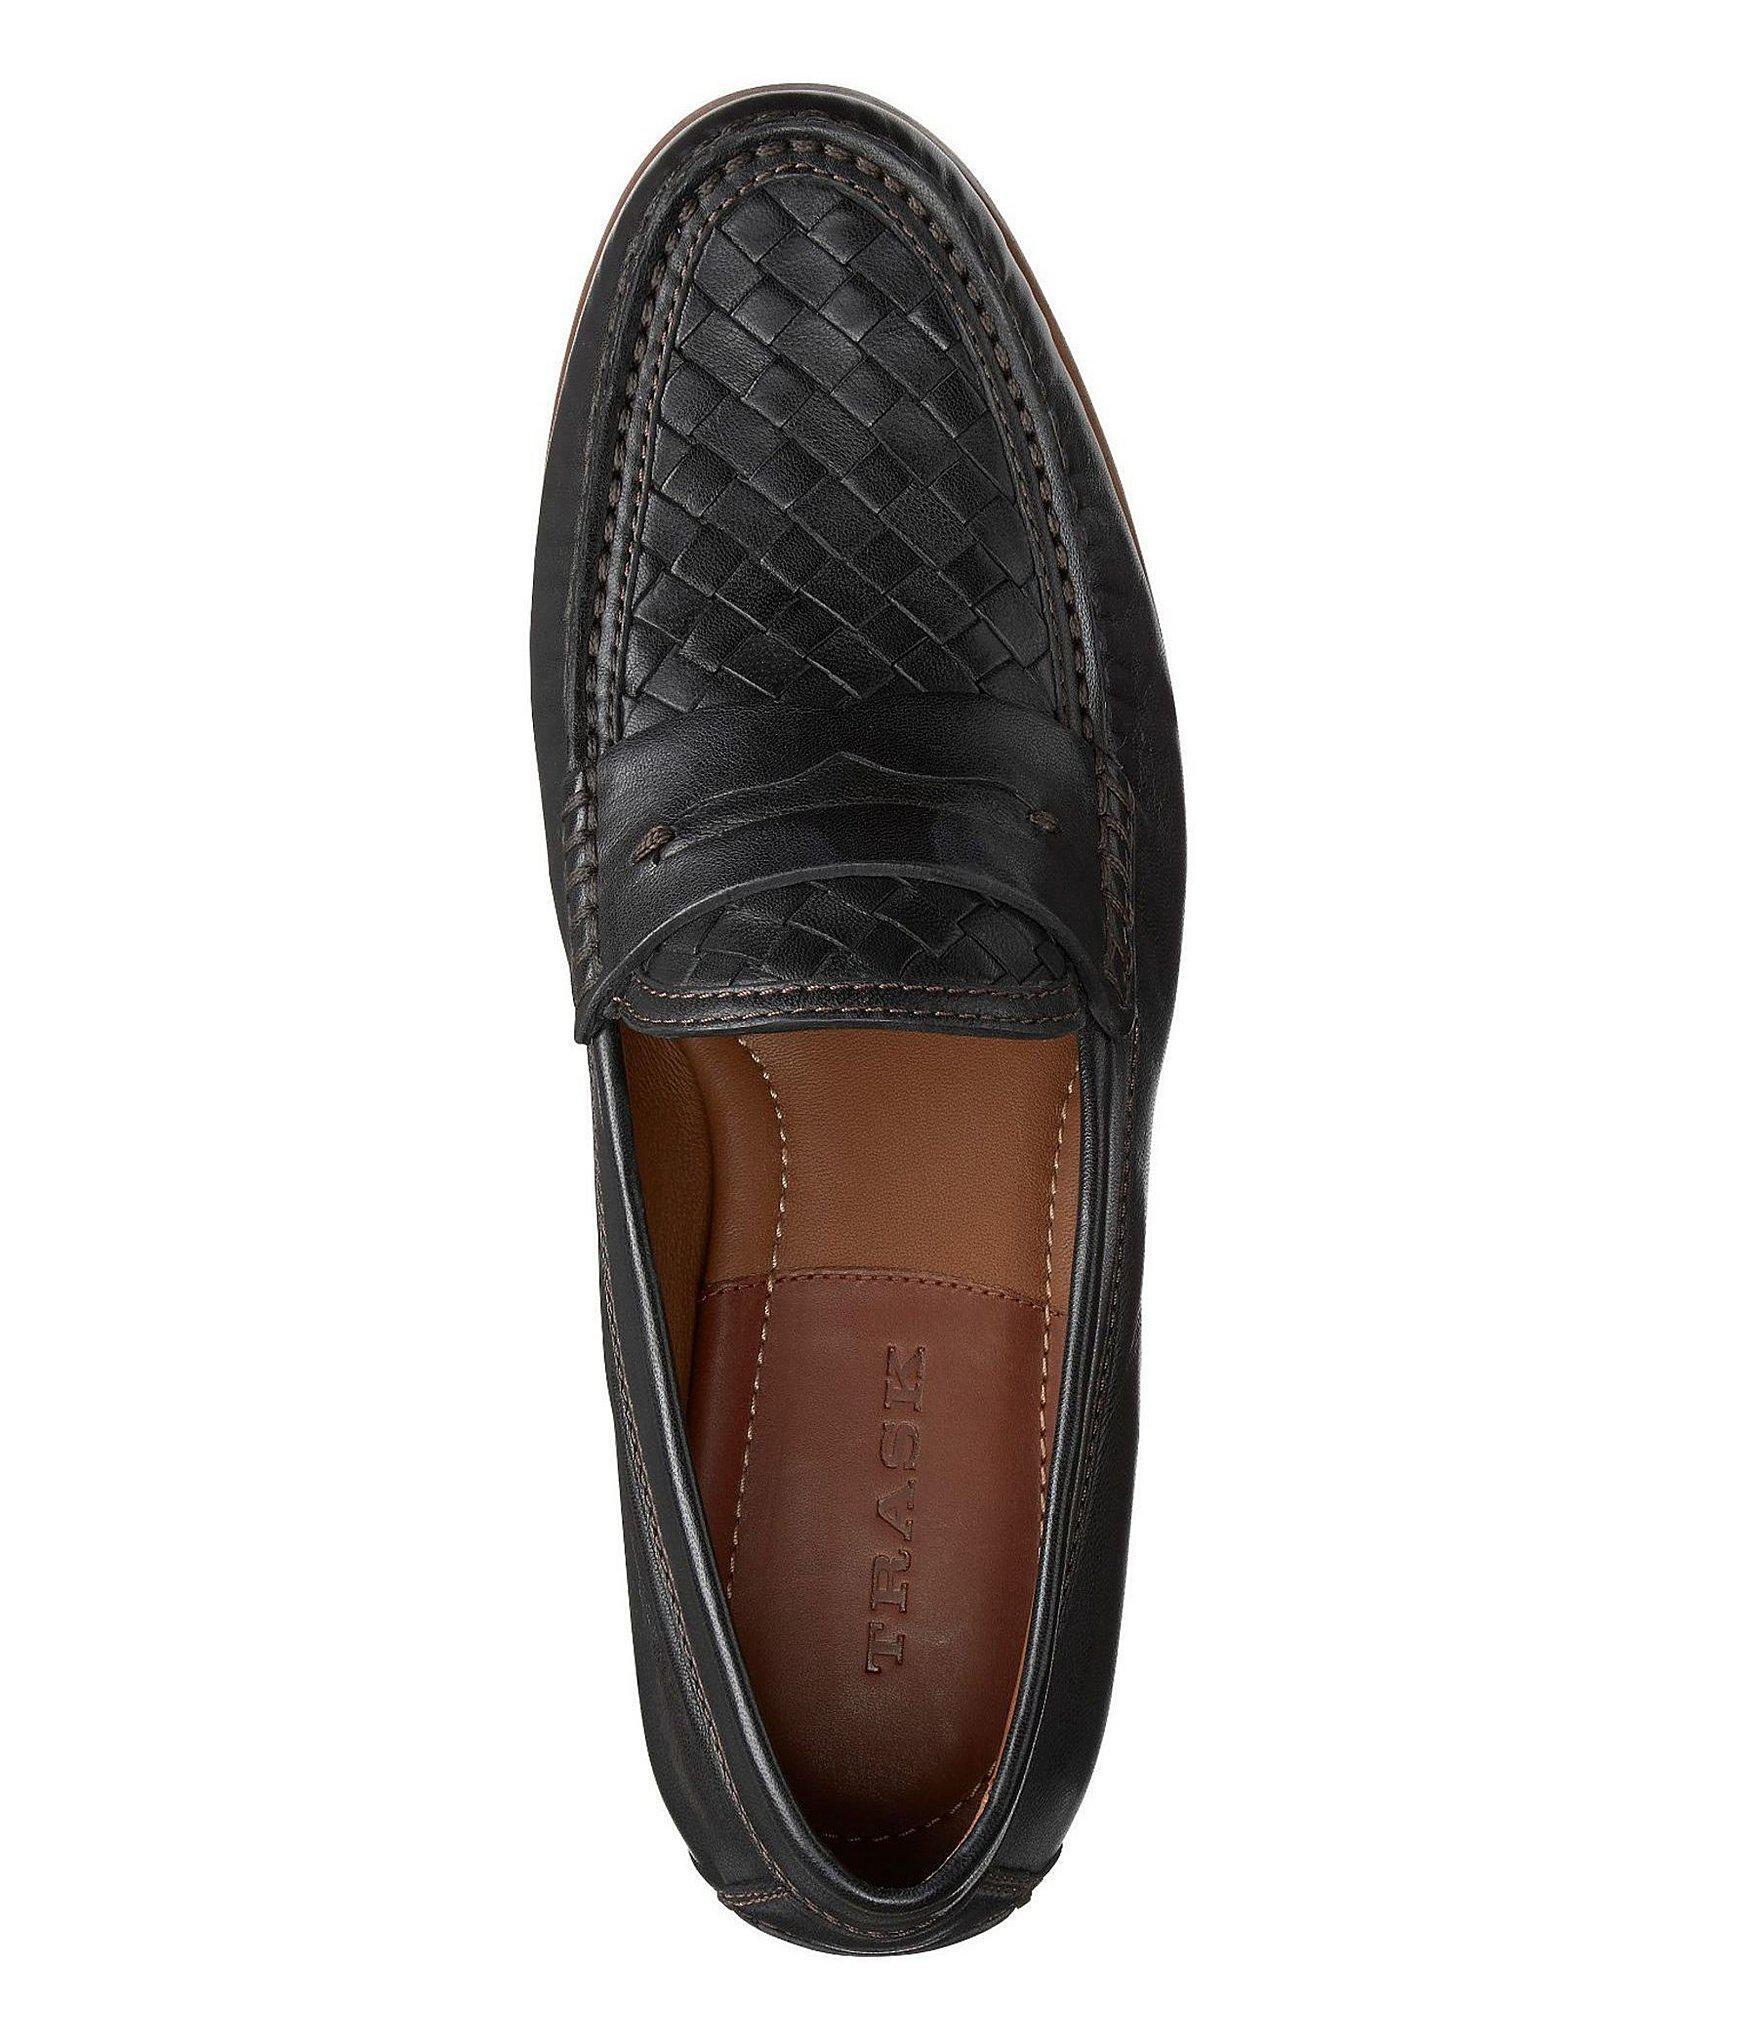 382a5d15430 Trask - Black Men s Slade Woven Loafers for Men - Lyst. View fullscreen